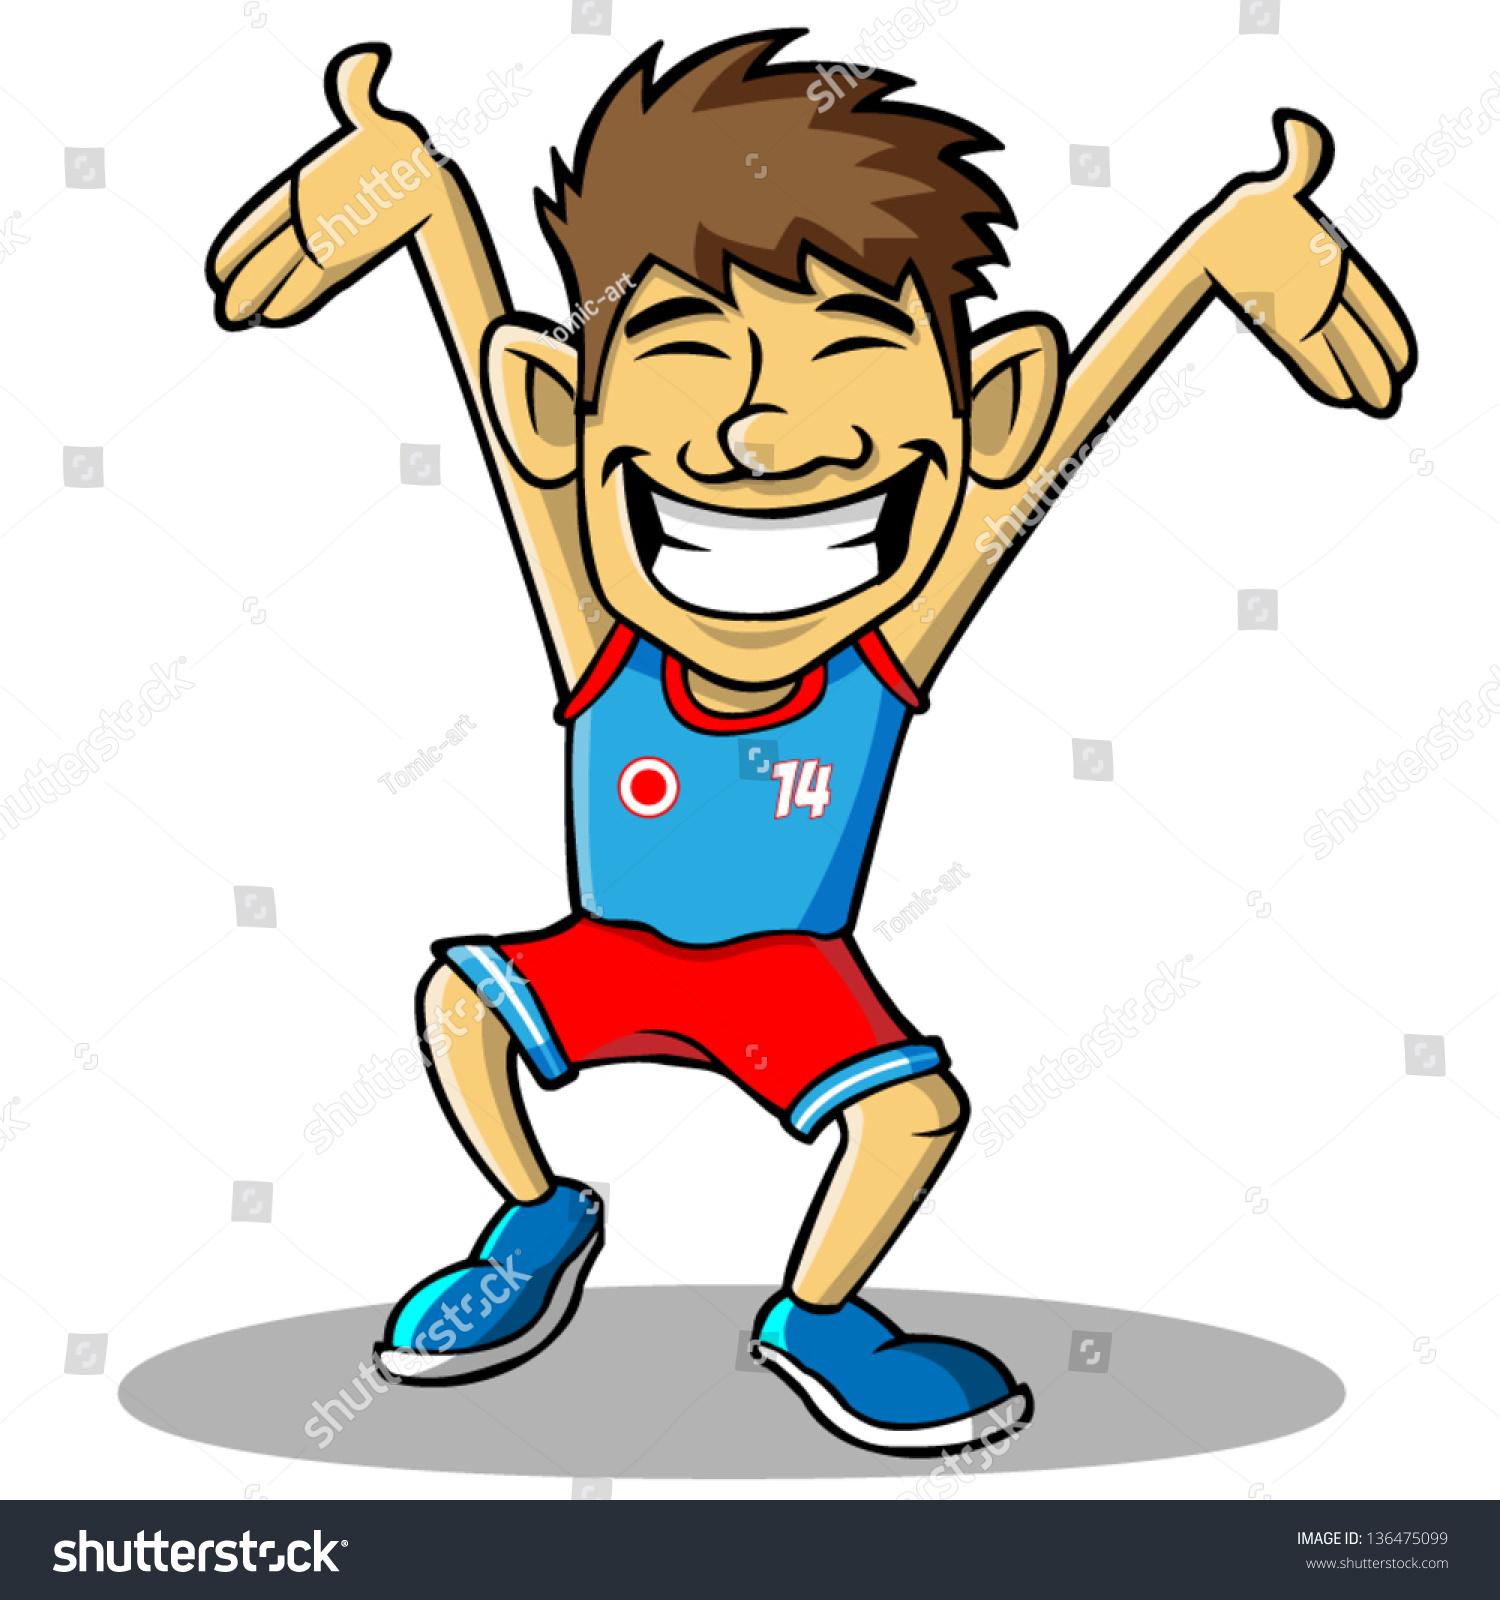 free clipart sports man - photo #7